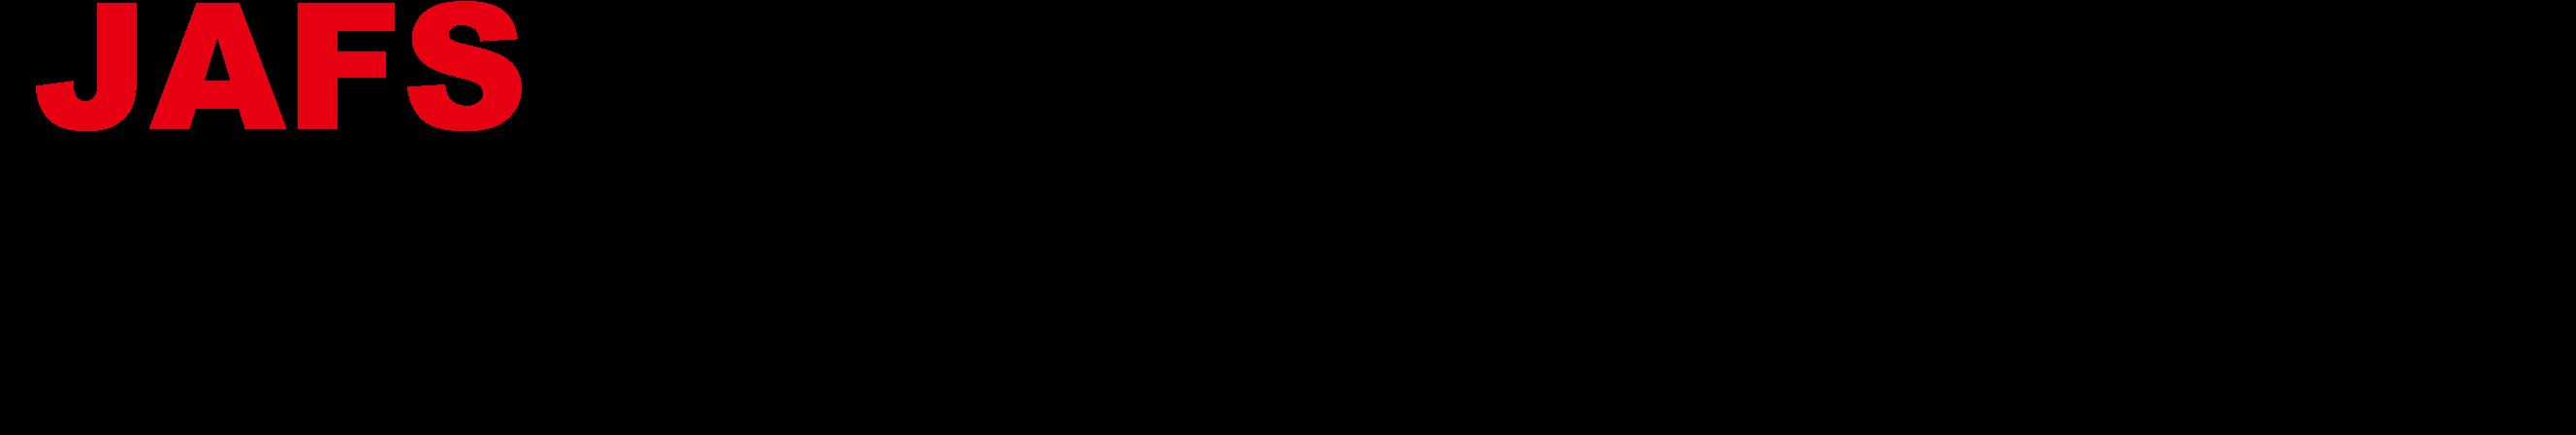 JAFS logo